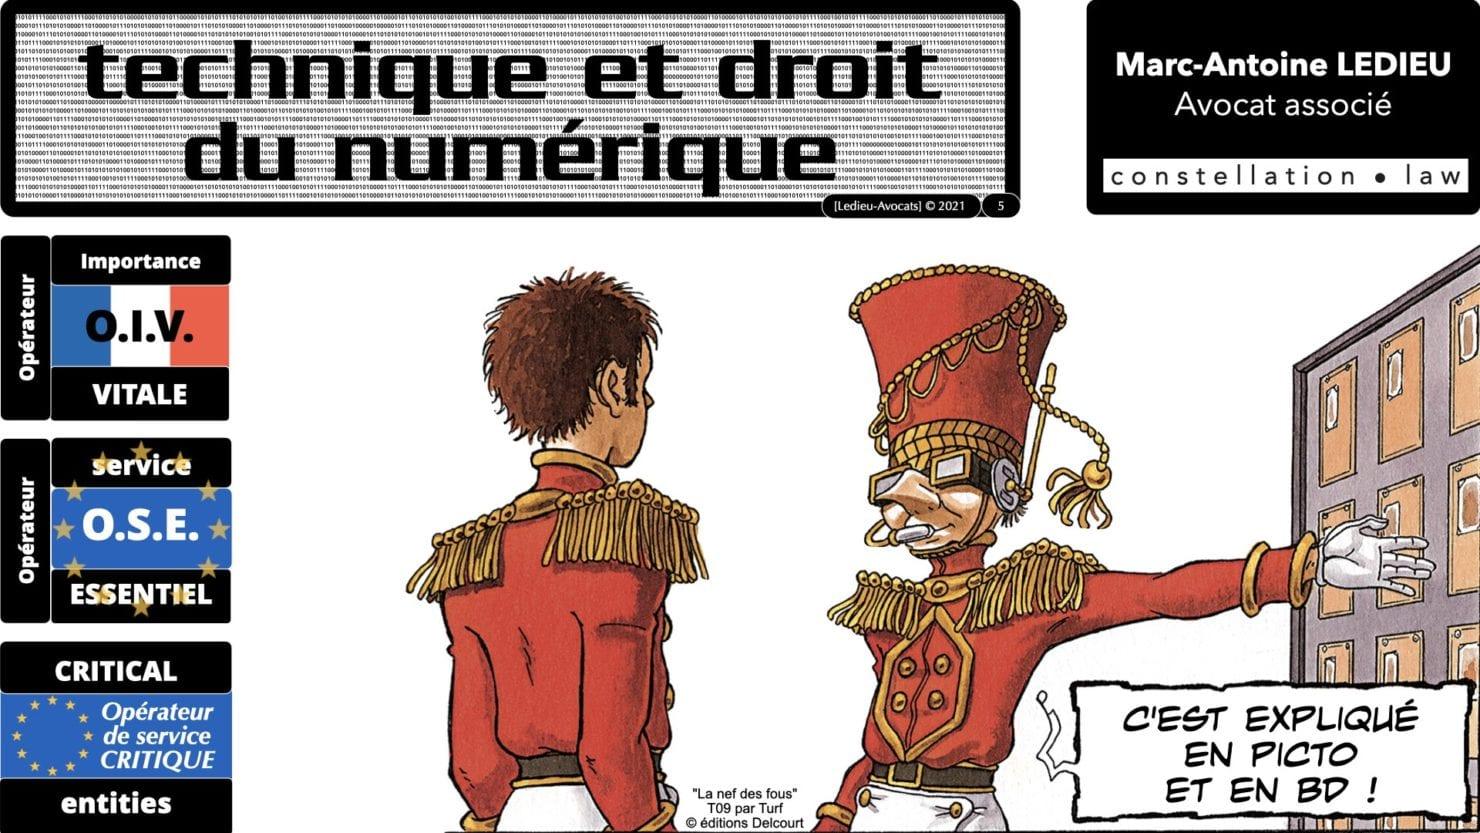 337 cyber sécurité #1 OIV OSE Critical Entities © Ledieu-avocat 15-06-2021.005